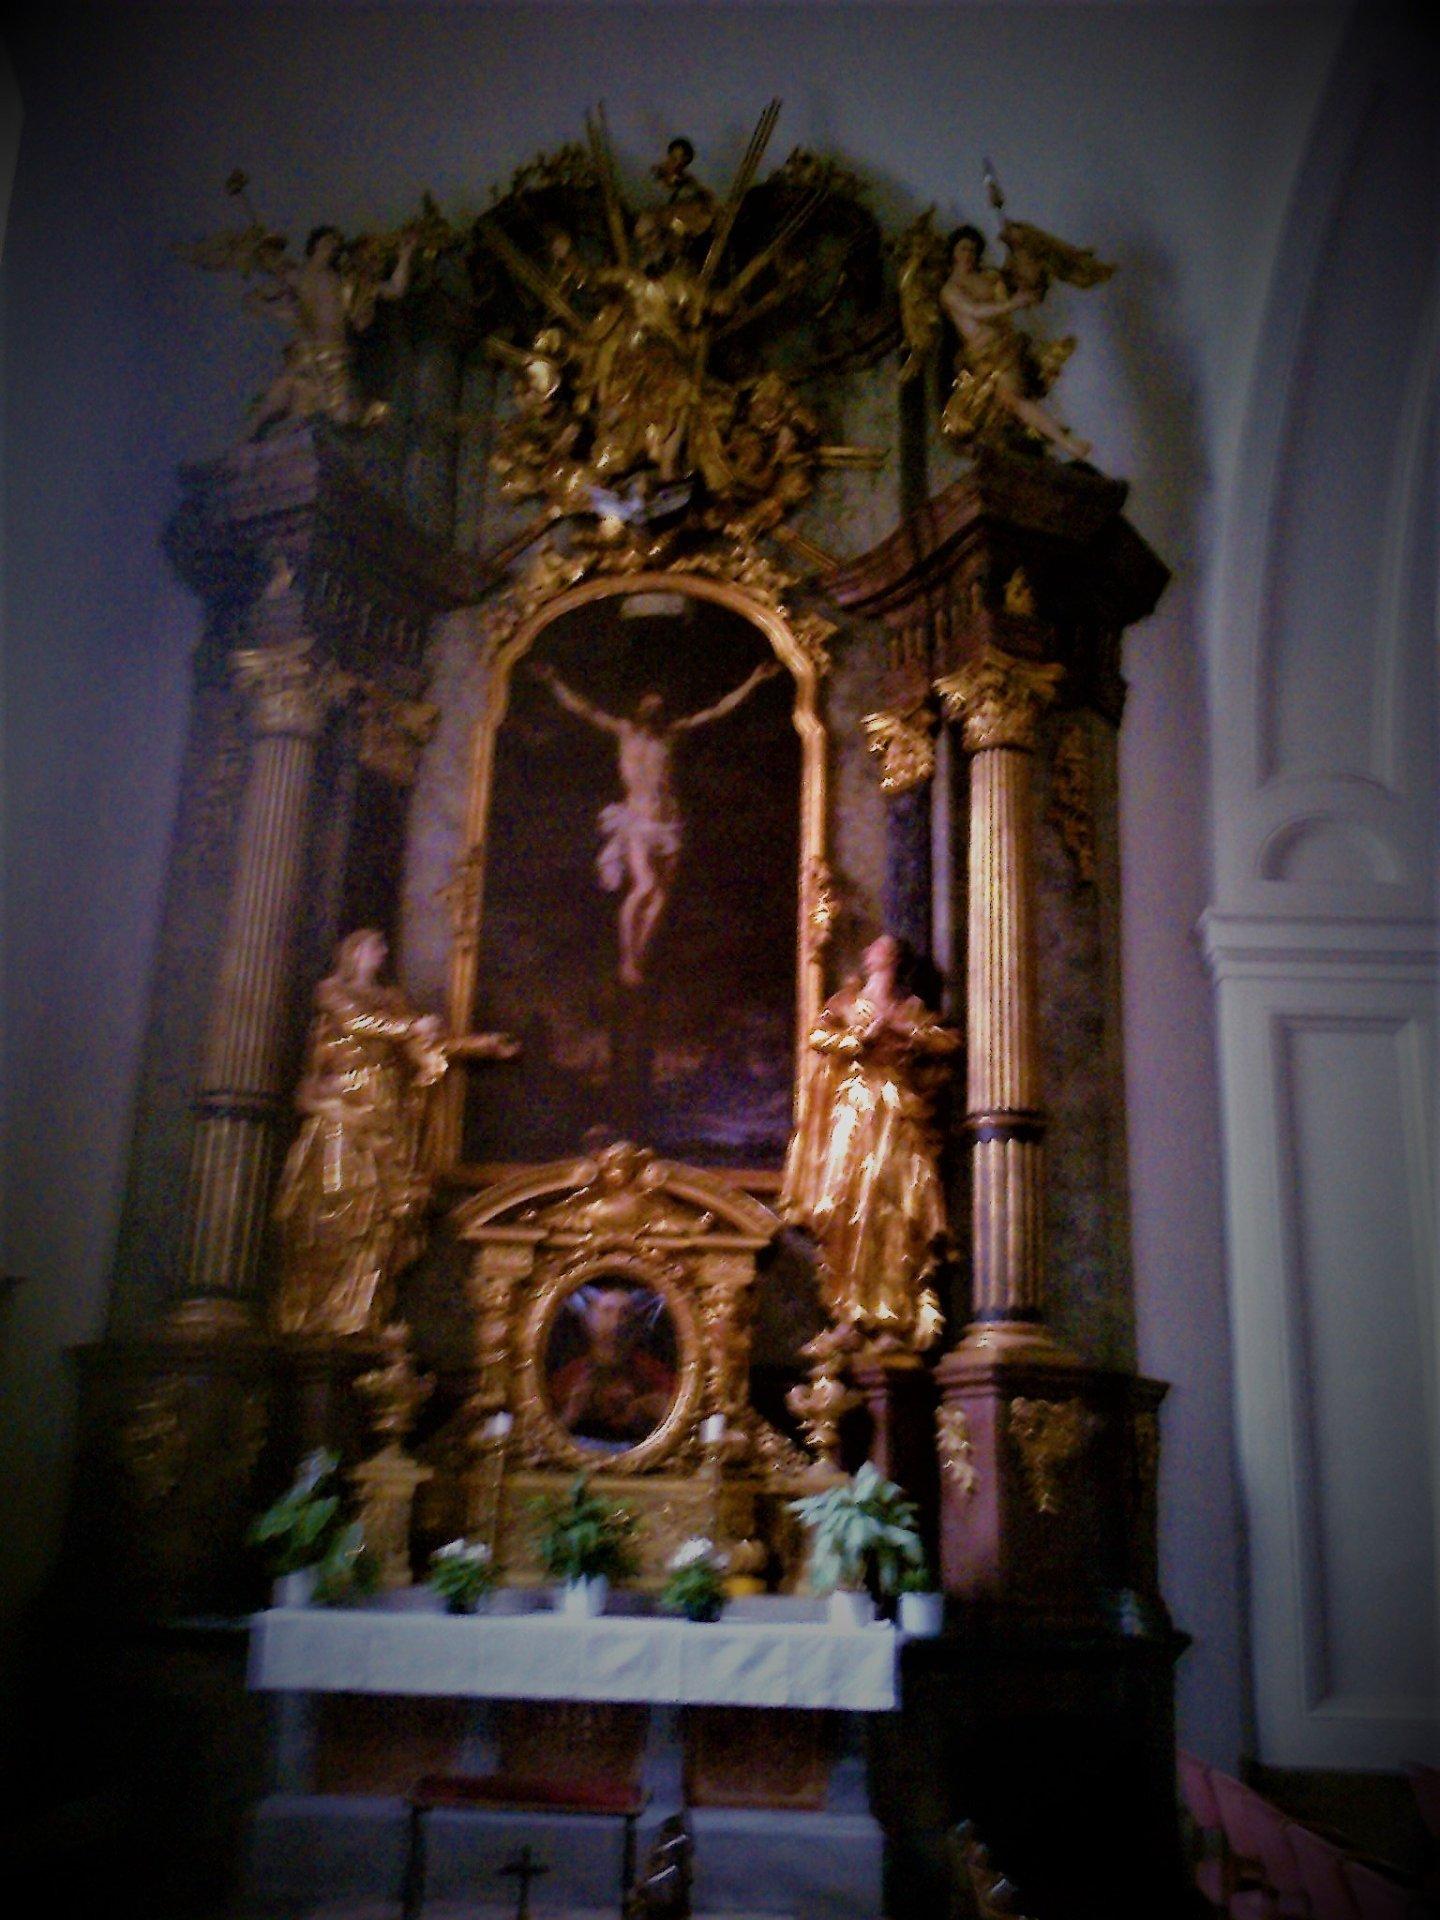 Graz church 5 - Graz: tradition and modernity